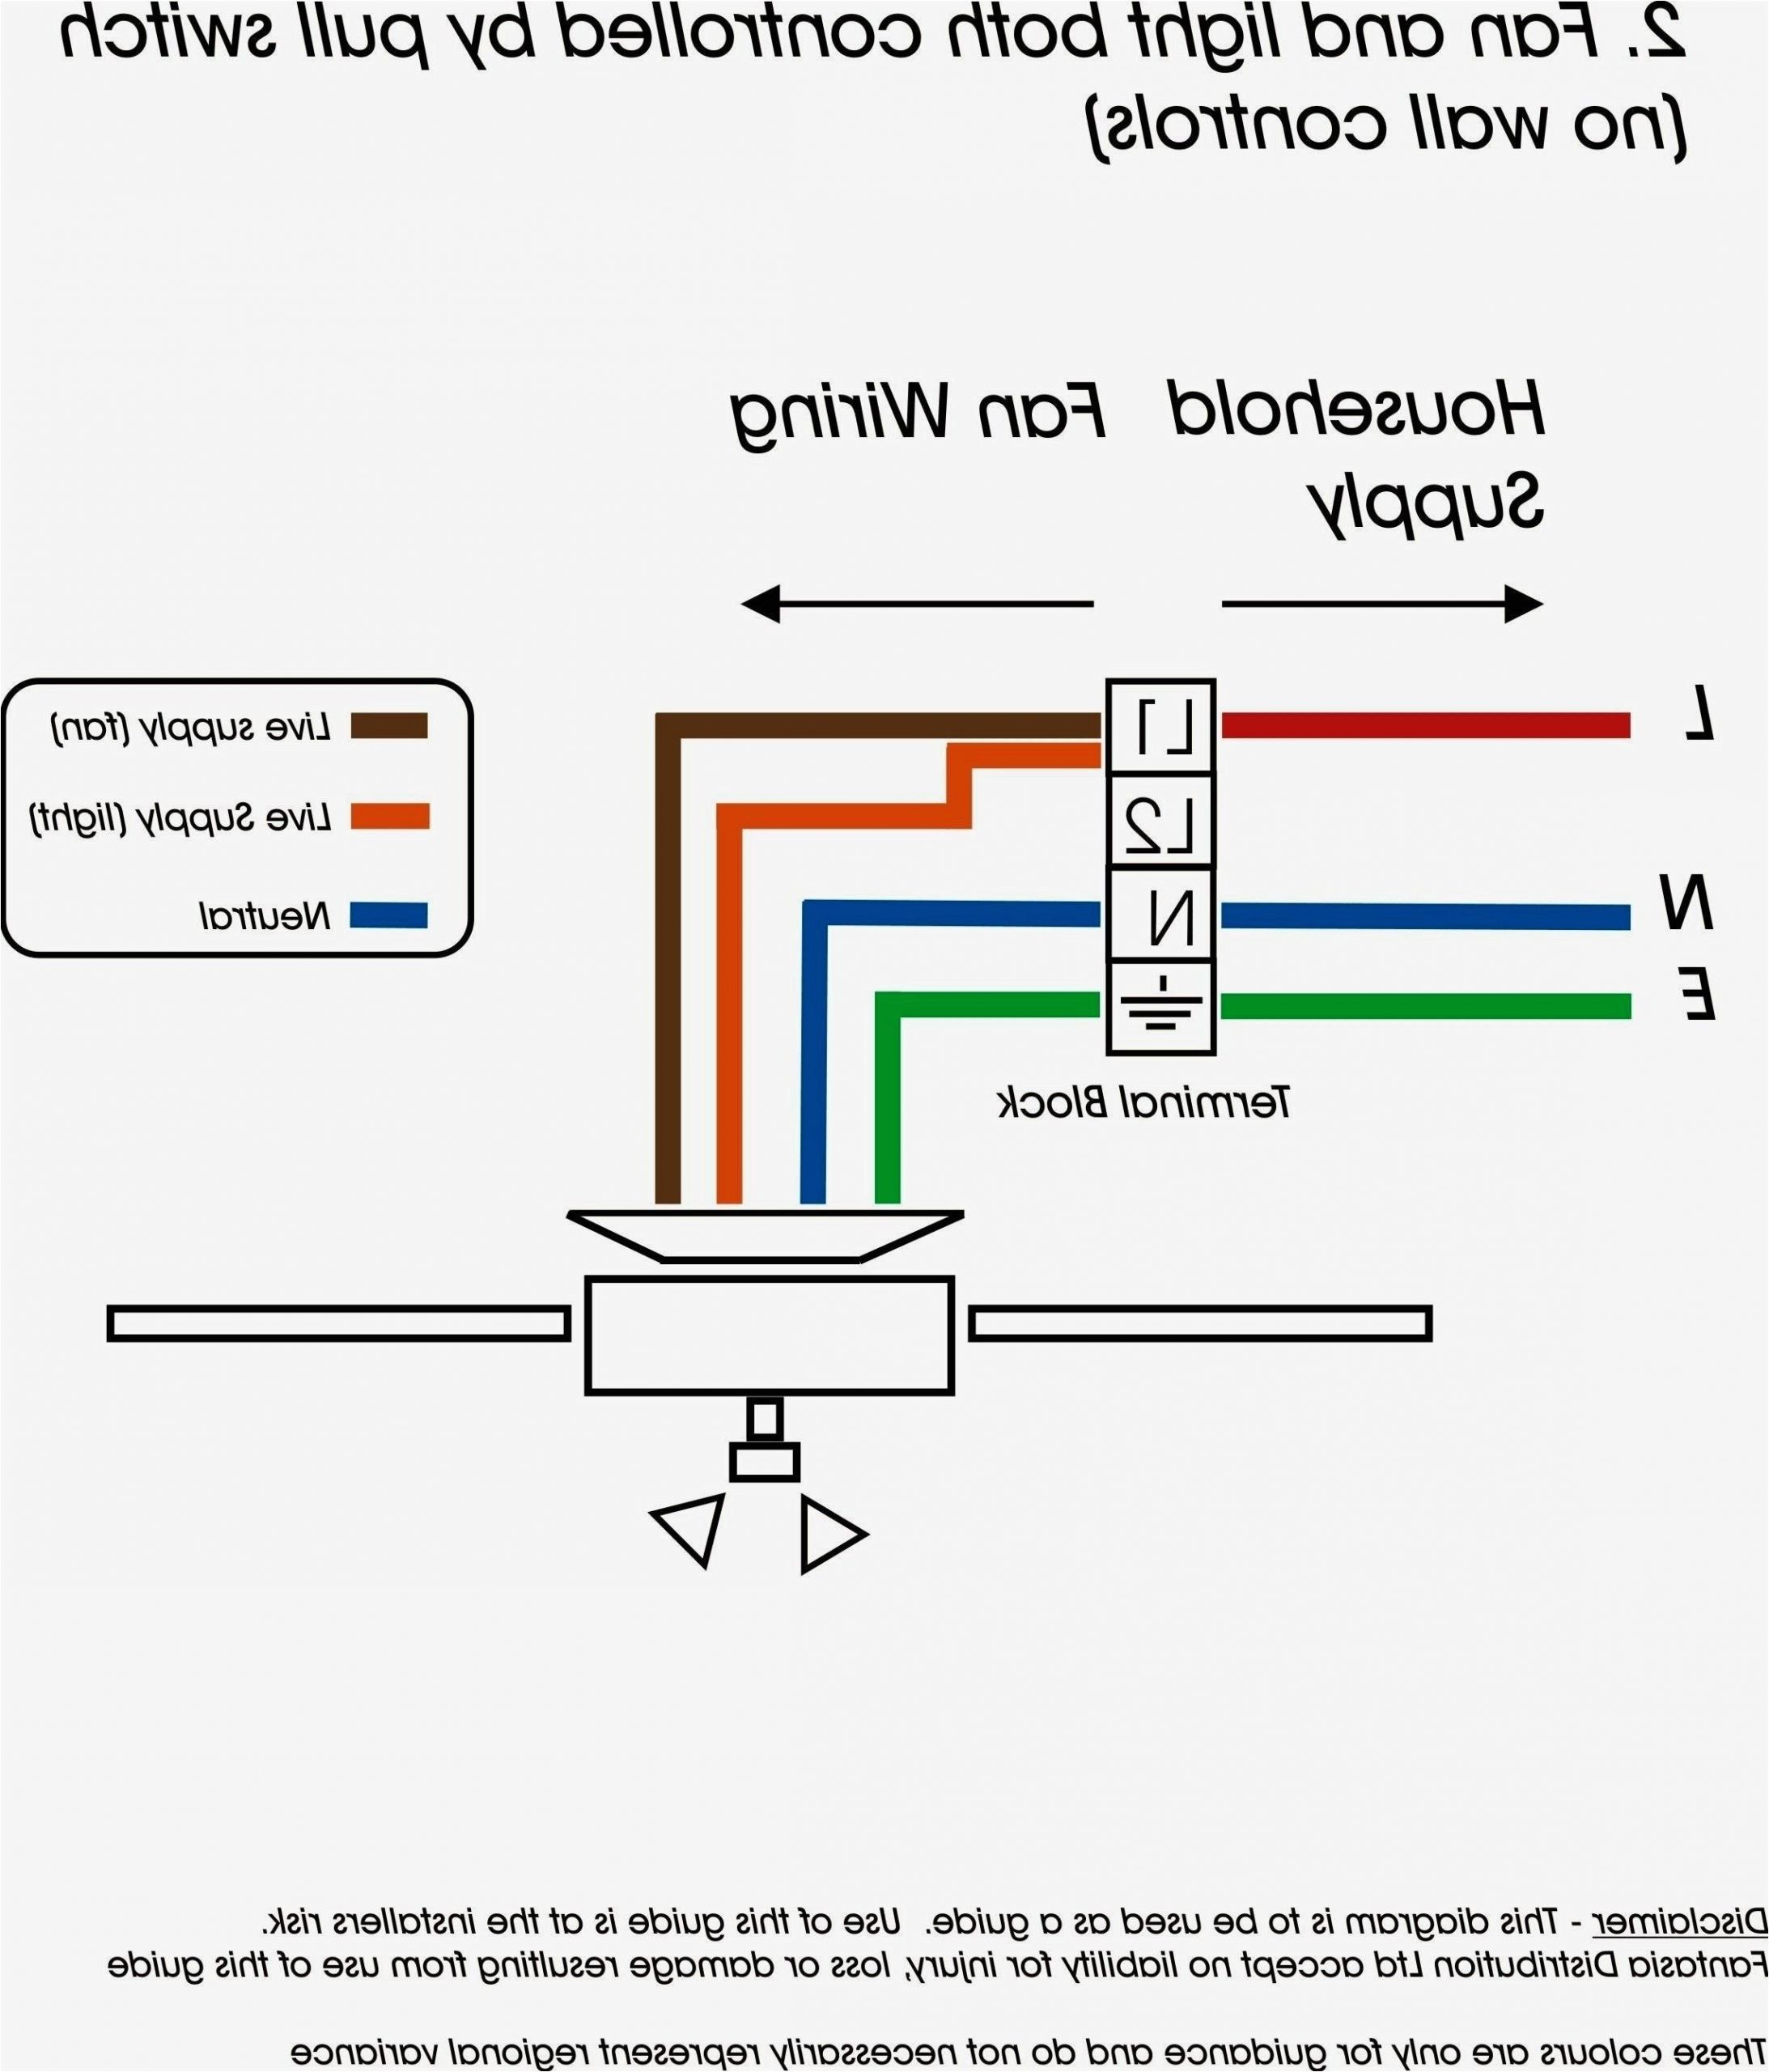 3 Speed Furnace Blower Motor Wiring Diagram Basic Flowchart Template Block Diagram In Visio 2010 Basic